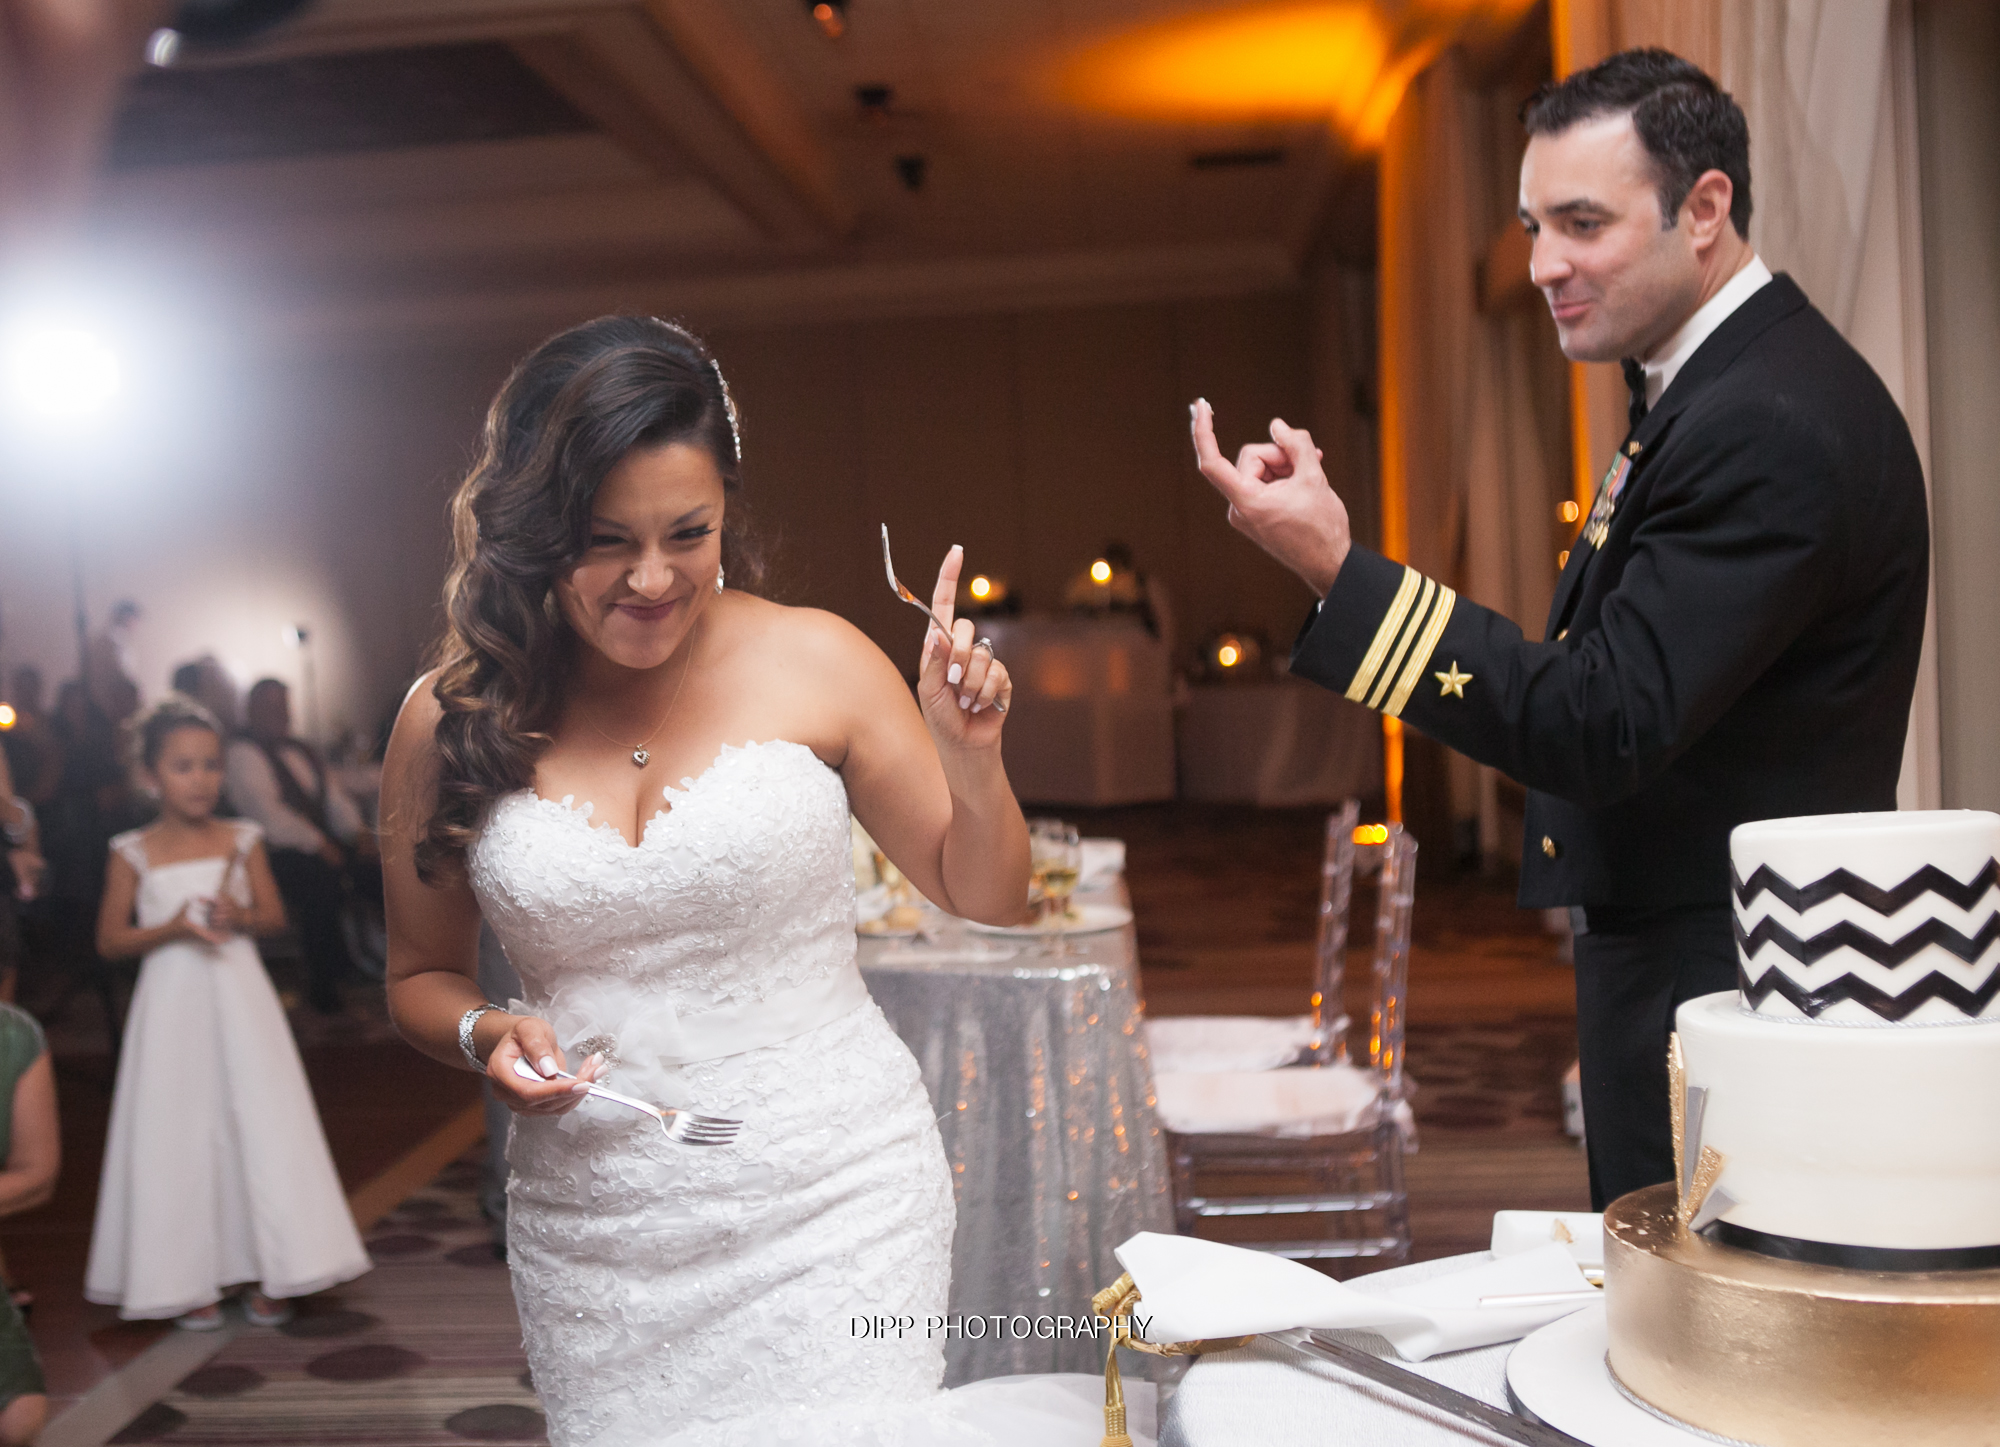 Dipp_2016 EDITED Sara & Brandon Wedding-566